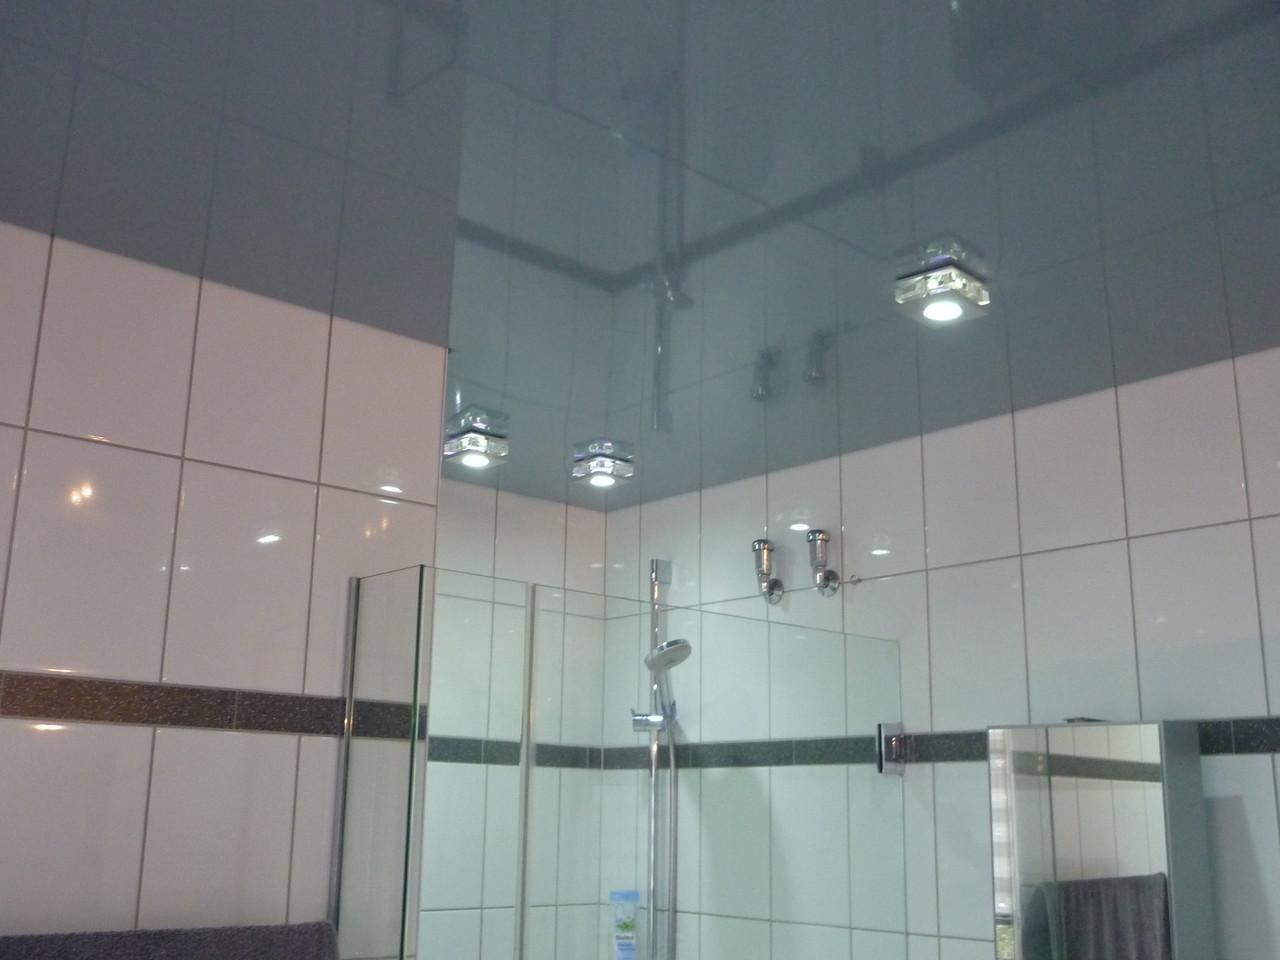 Spanndecke Grau glänzend Badezimmer Iserlohn